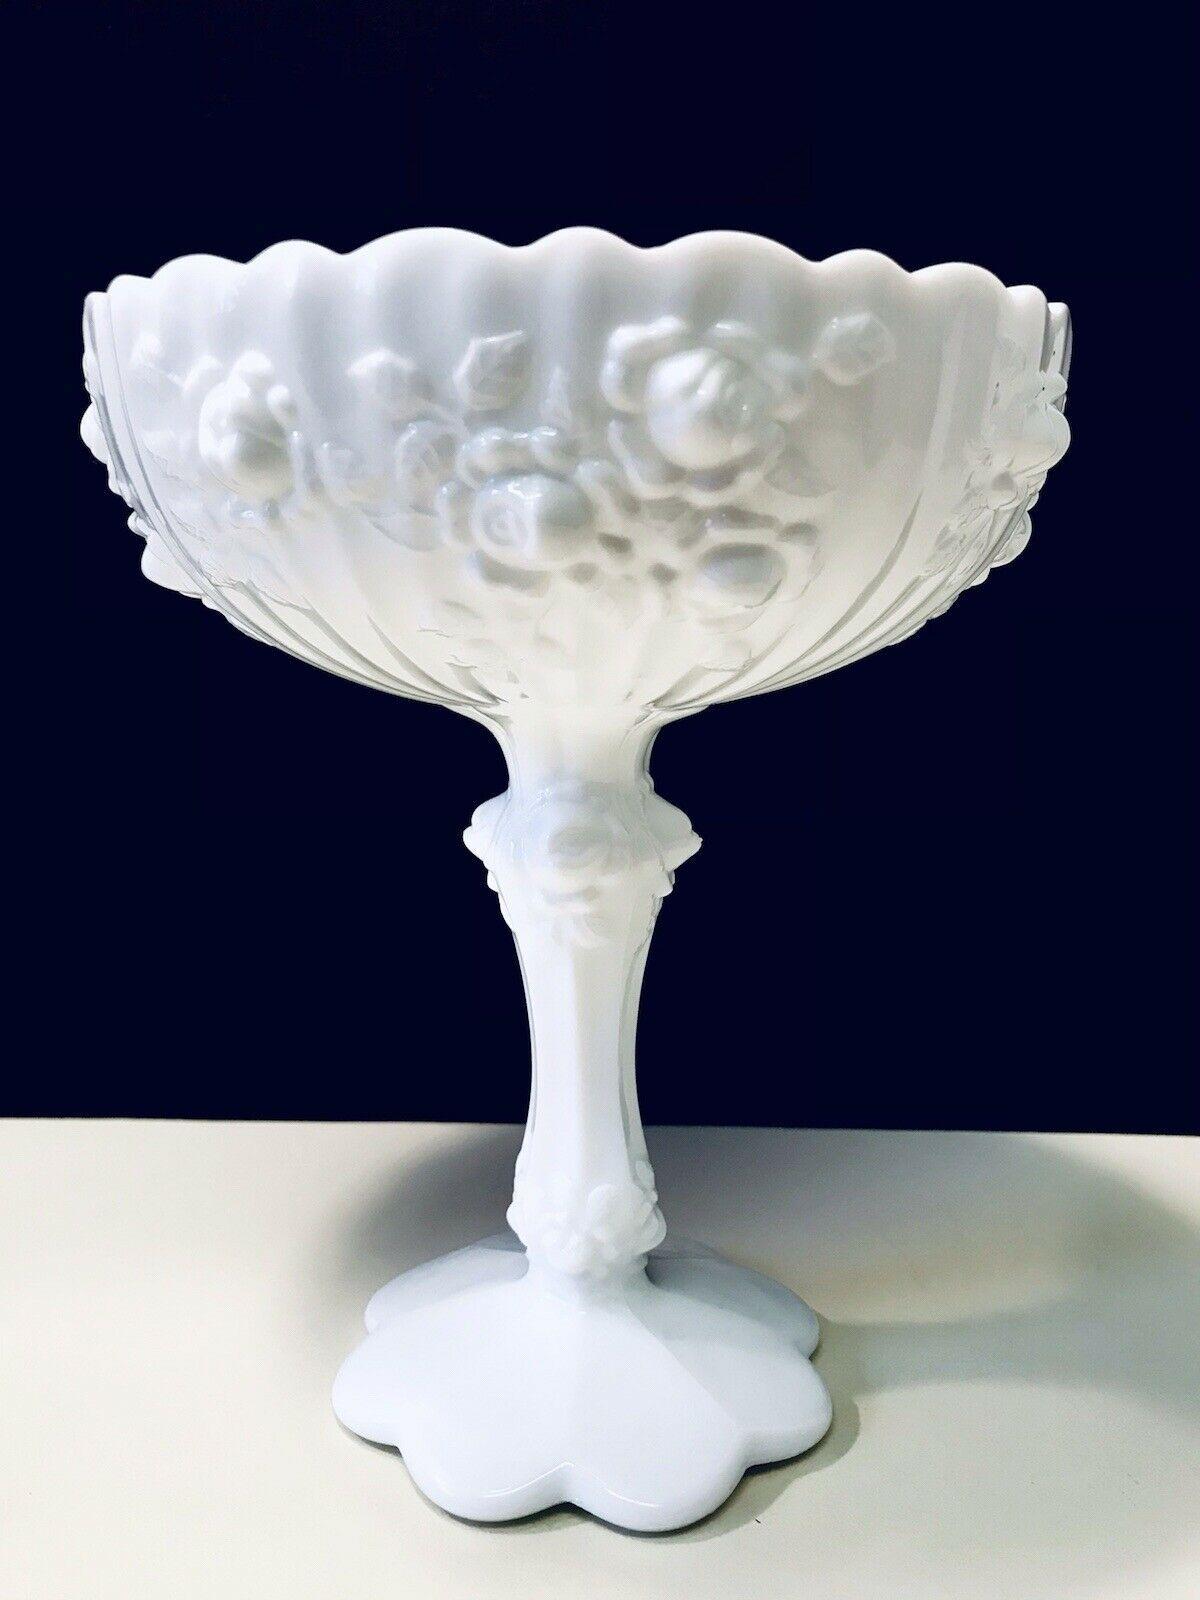 Fenton Vintage 1970's White Cabbage Rose Milk Glass Scalloped Rim Pedestal Bowl - $28.01